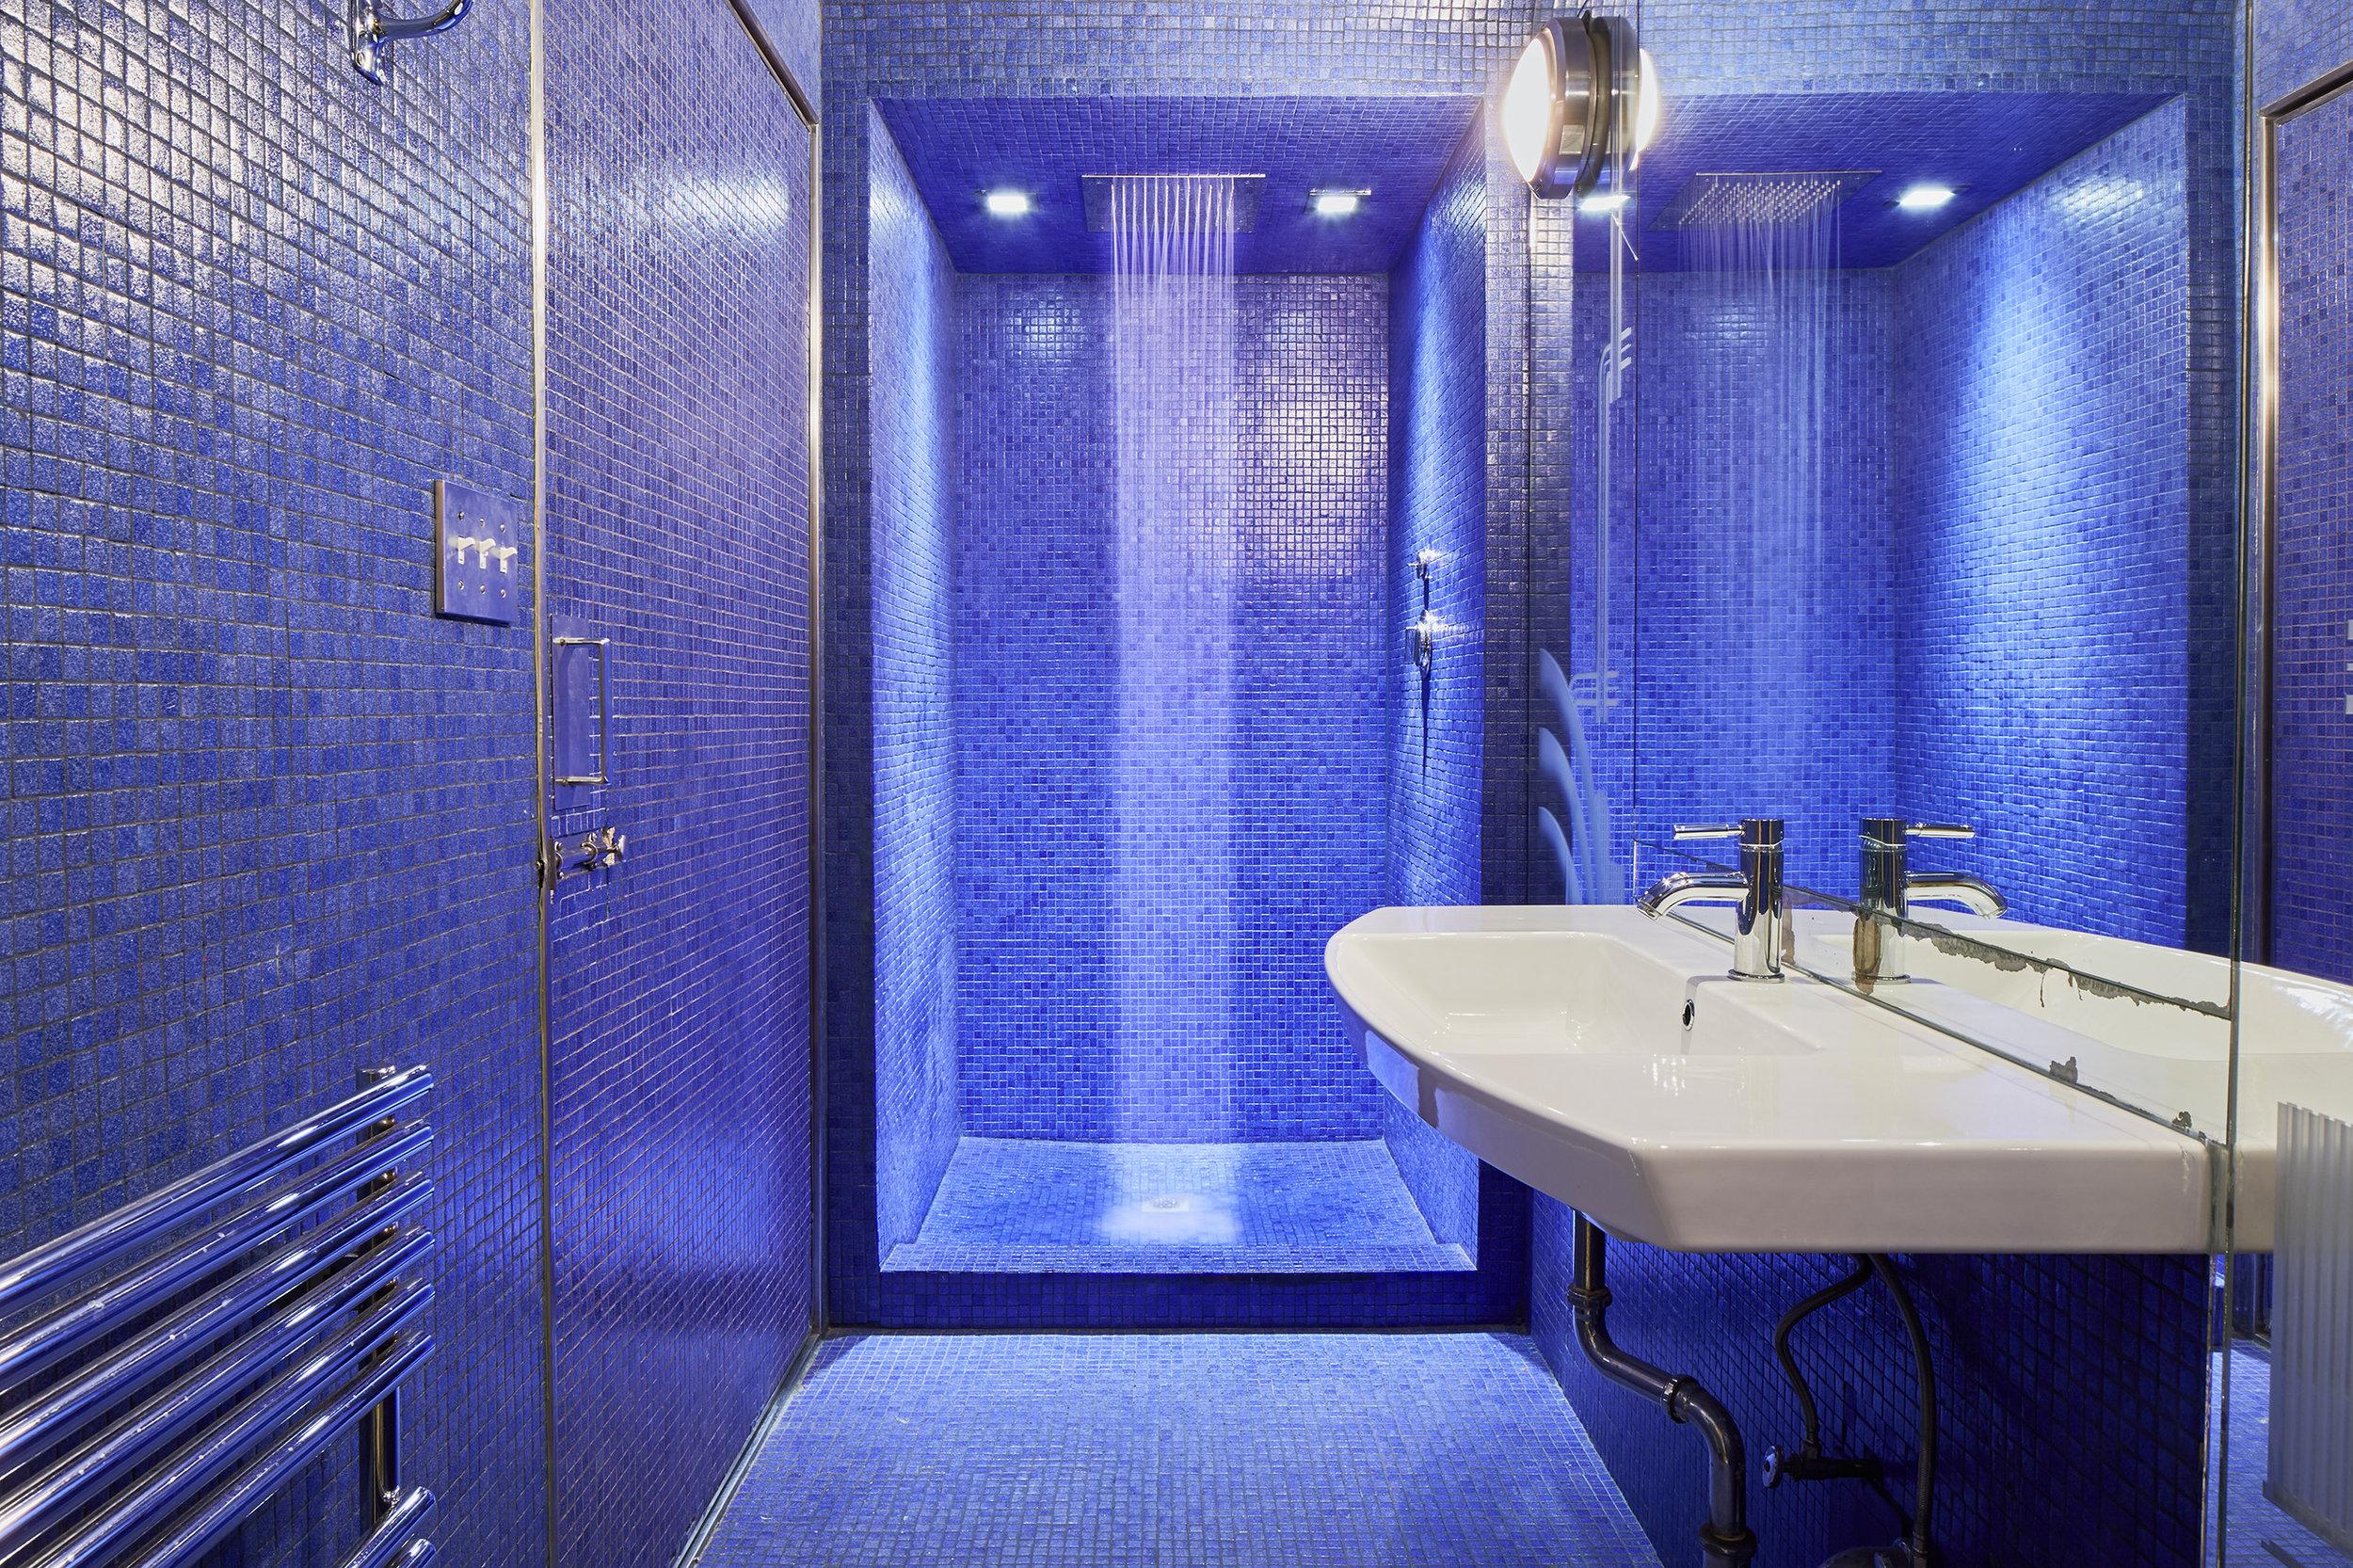 161128-Bathhouse-0139-LR.jpg